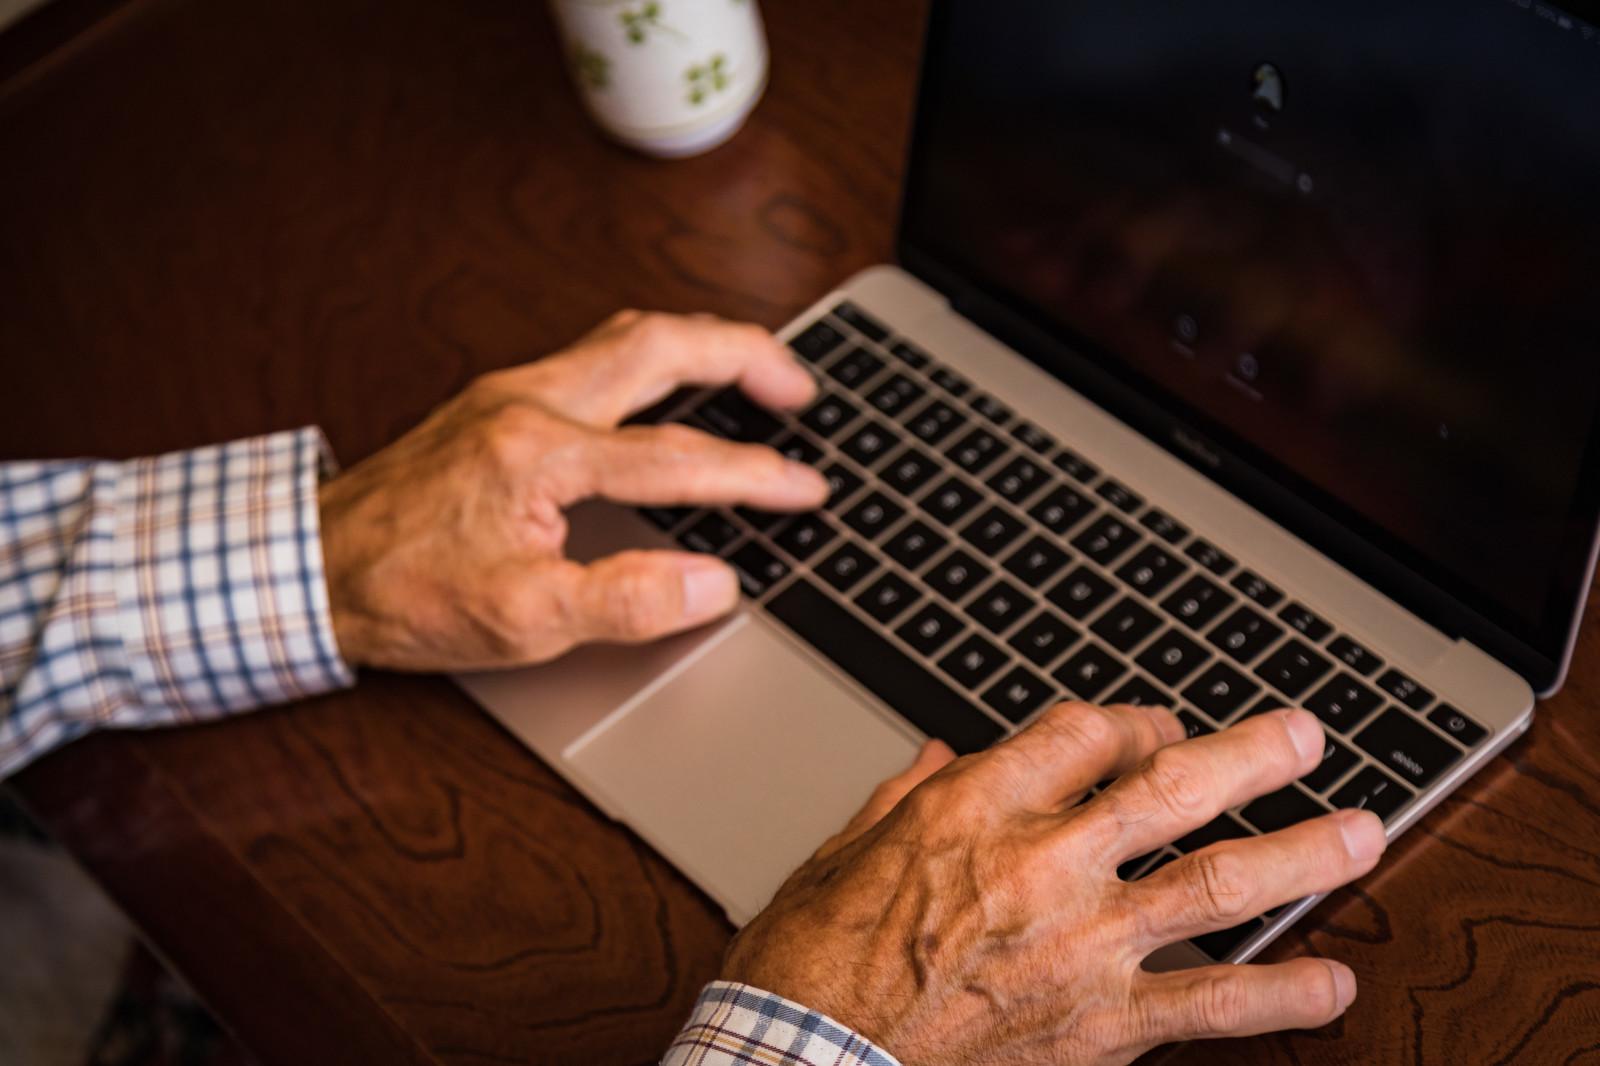 Mac を操作する高齢者の手